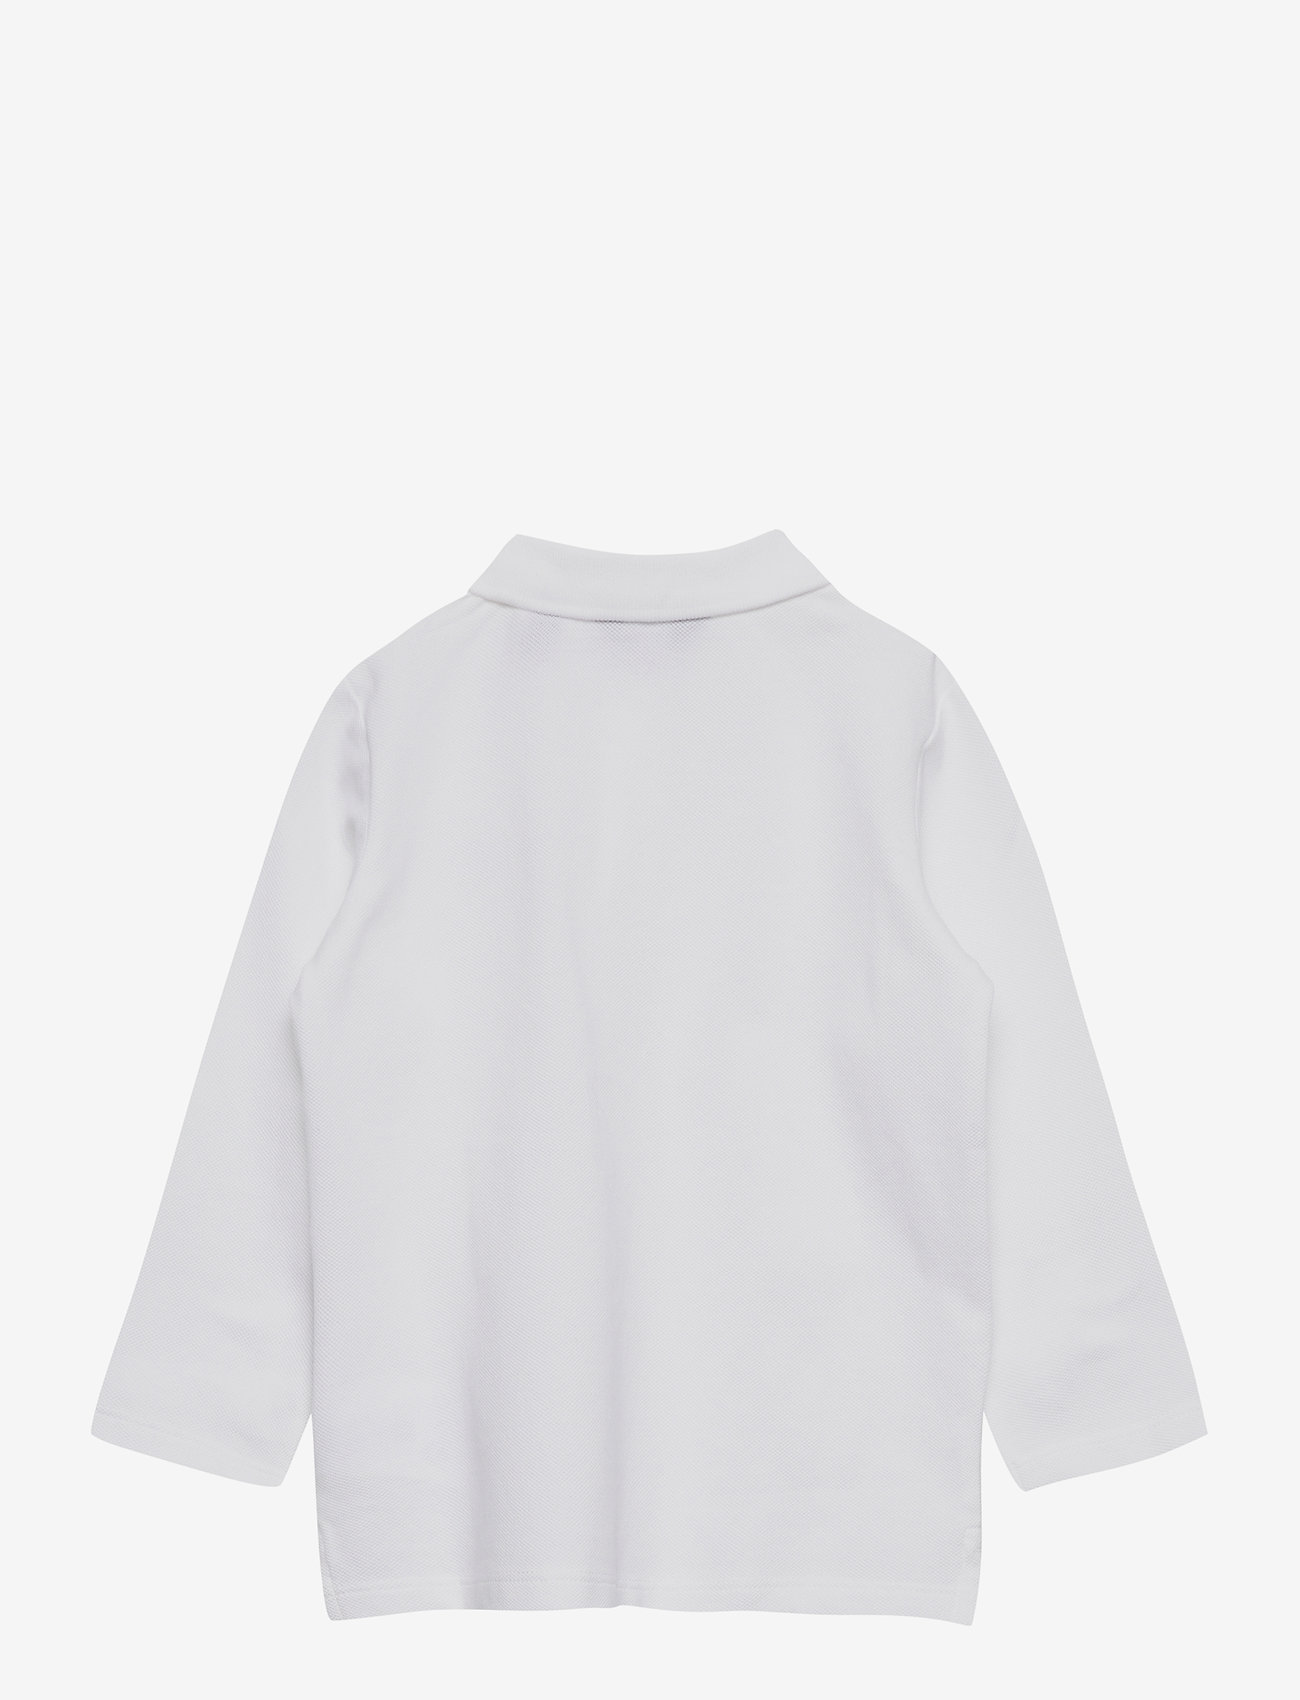 GANT - THE ORIGINAL PIQUE LS RUGGER - polo shirts - white - 1